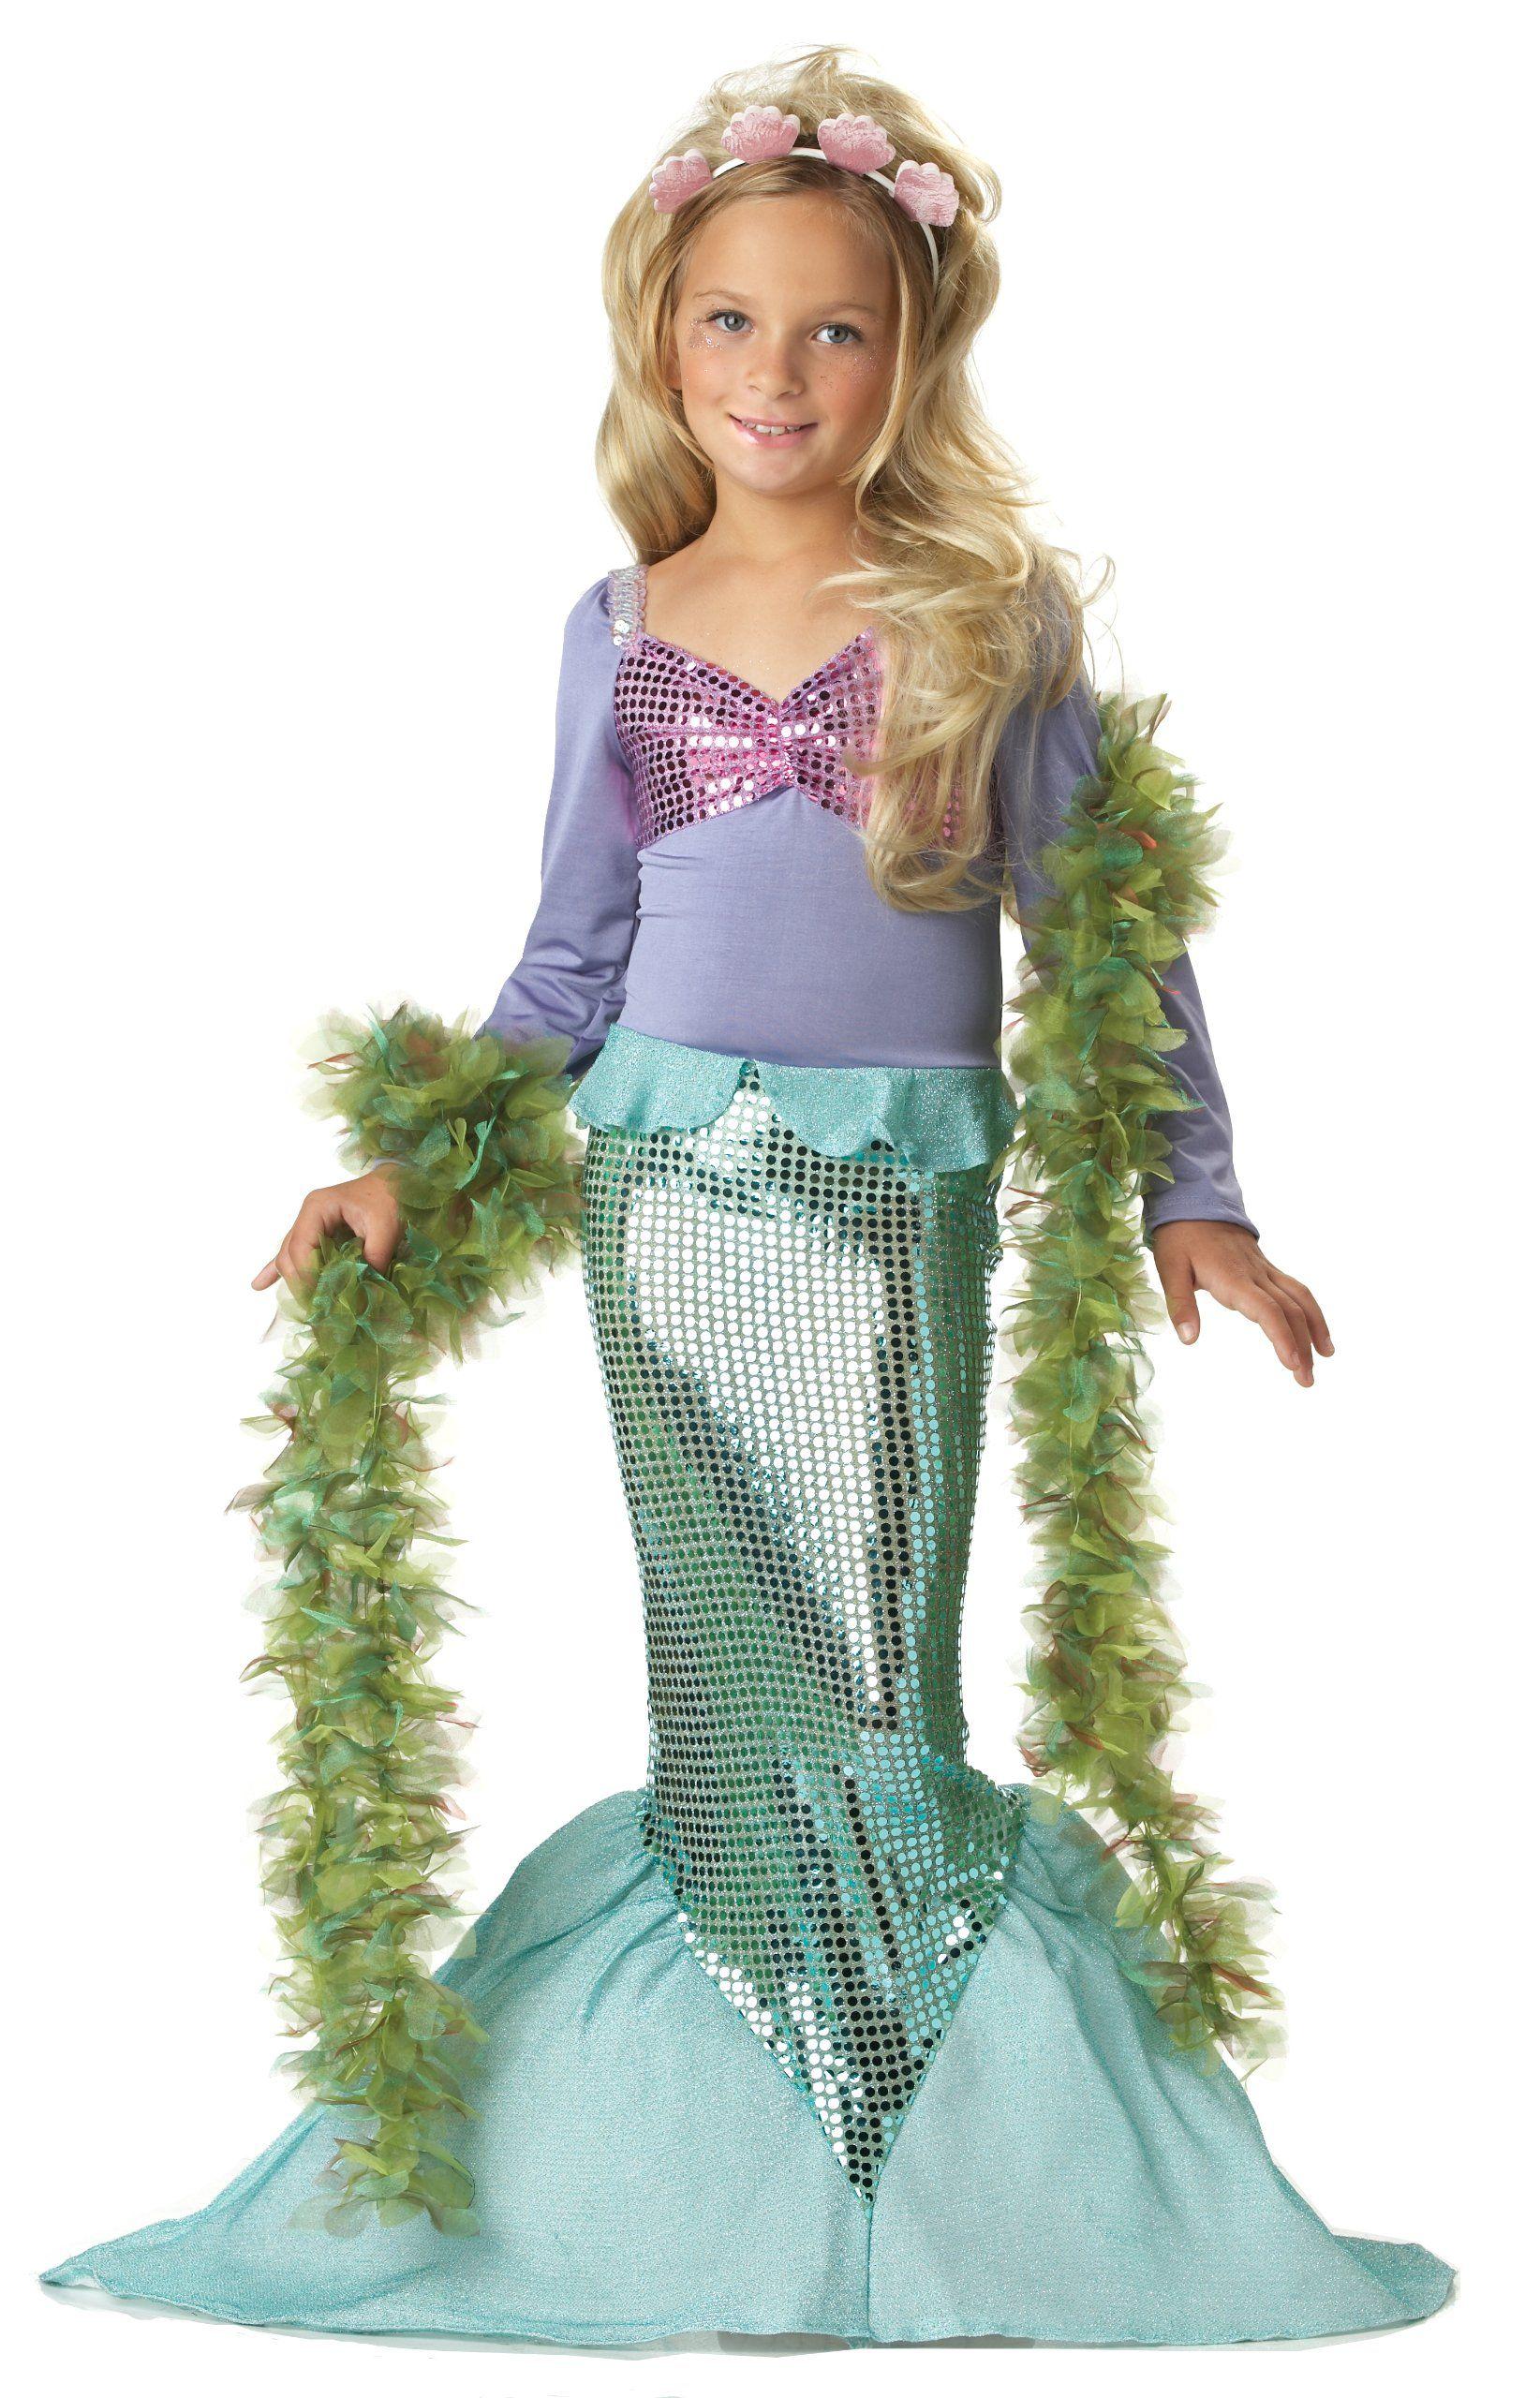 Arielle Kinderkostüm Nixe Mädchenkostüm Mermaid